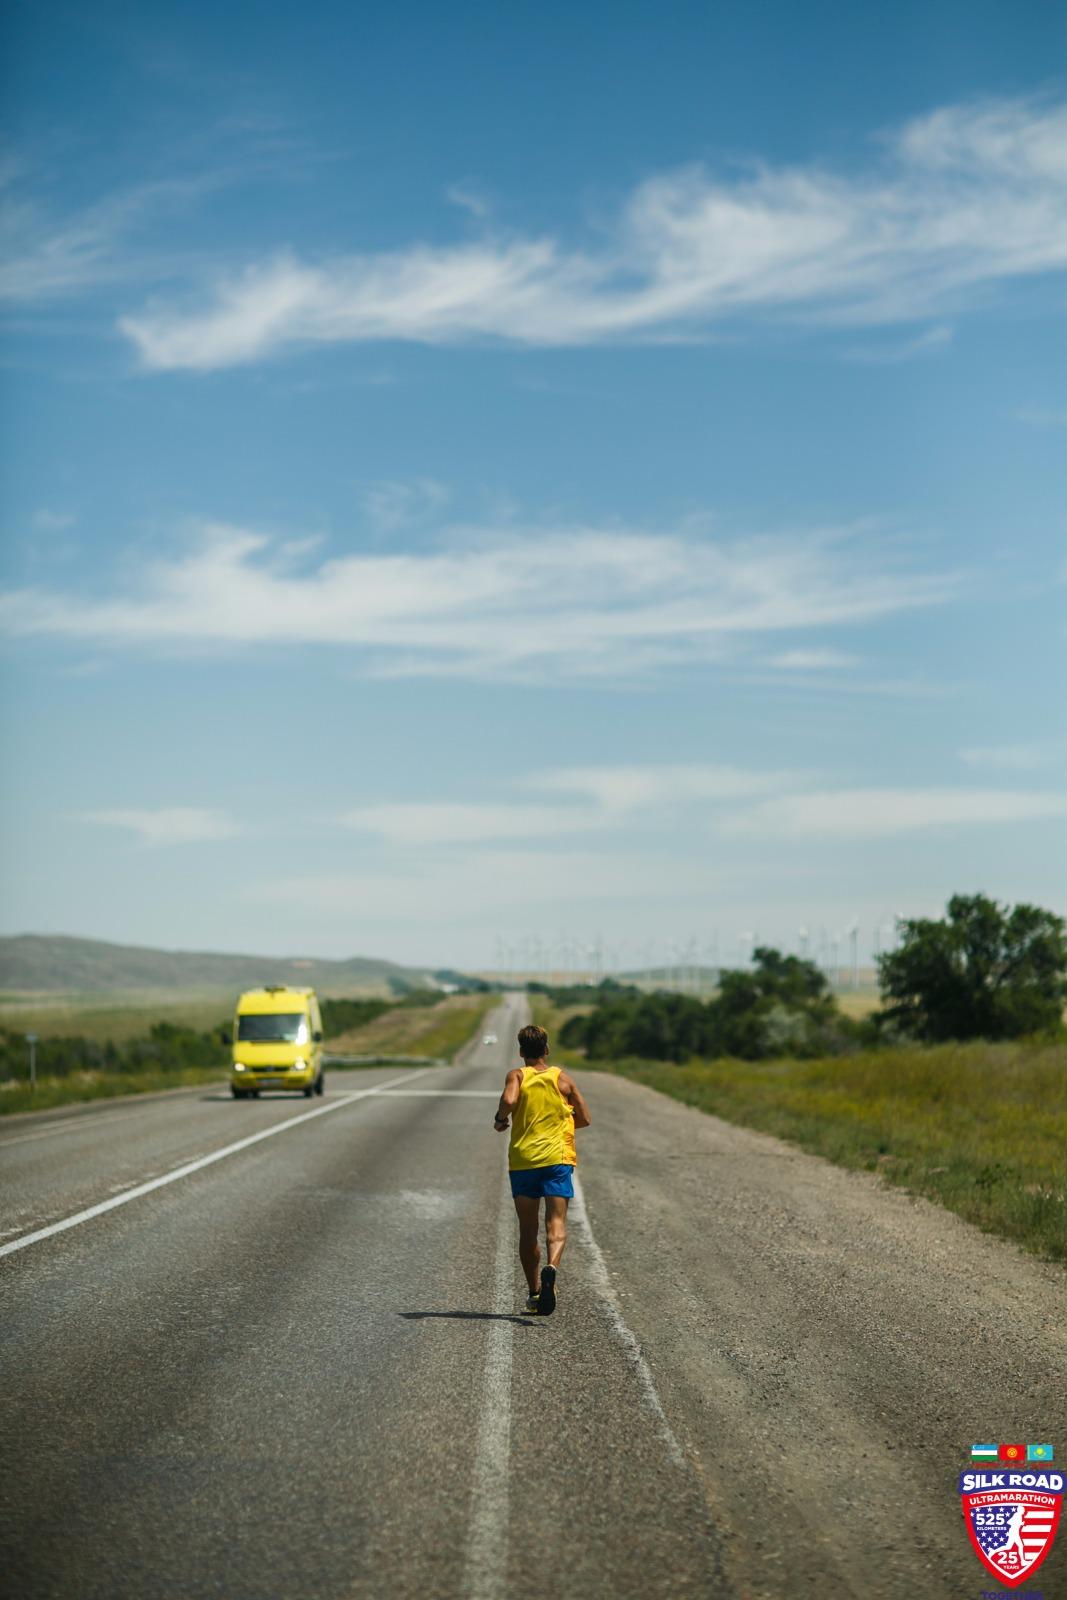 Dean running on highway